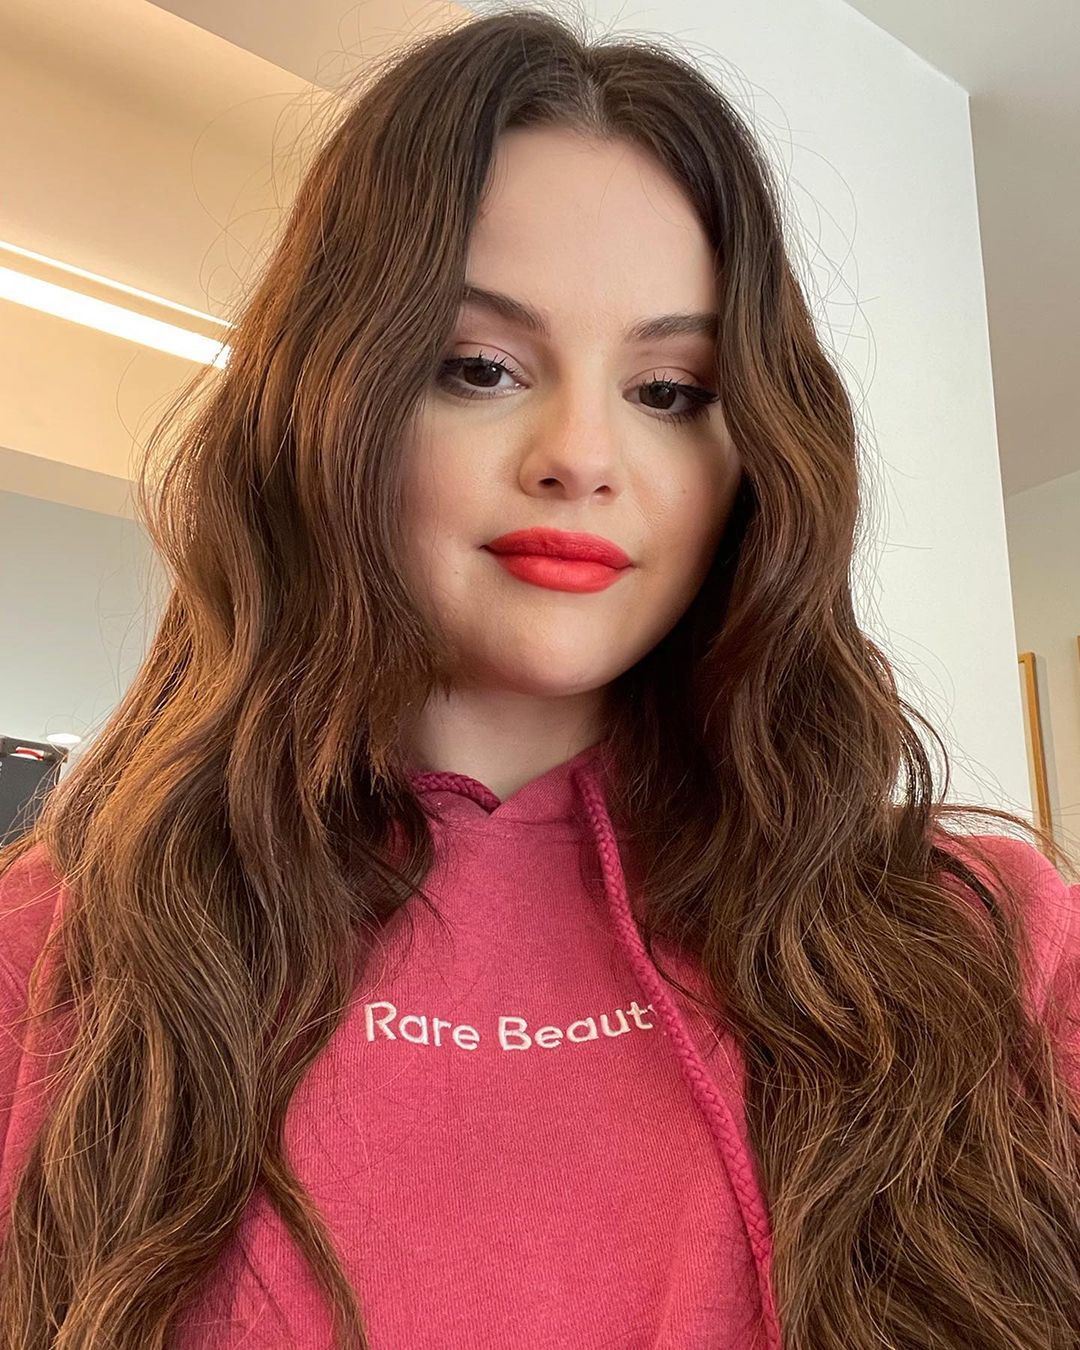 where to get Selena Gomez pink Rare Beauty Hoodie September 2021 Photo Rare Beauty